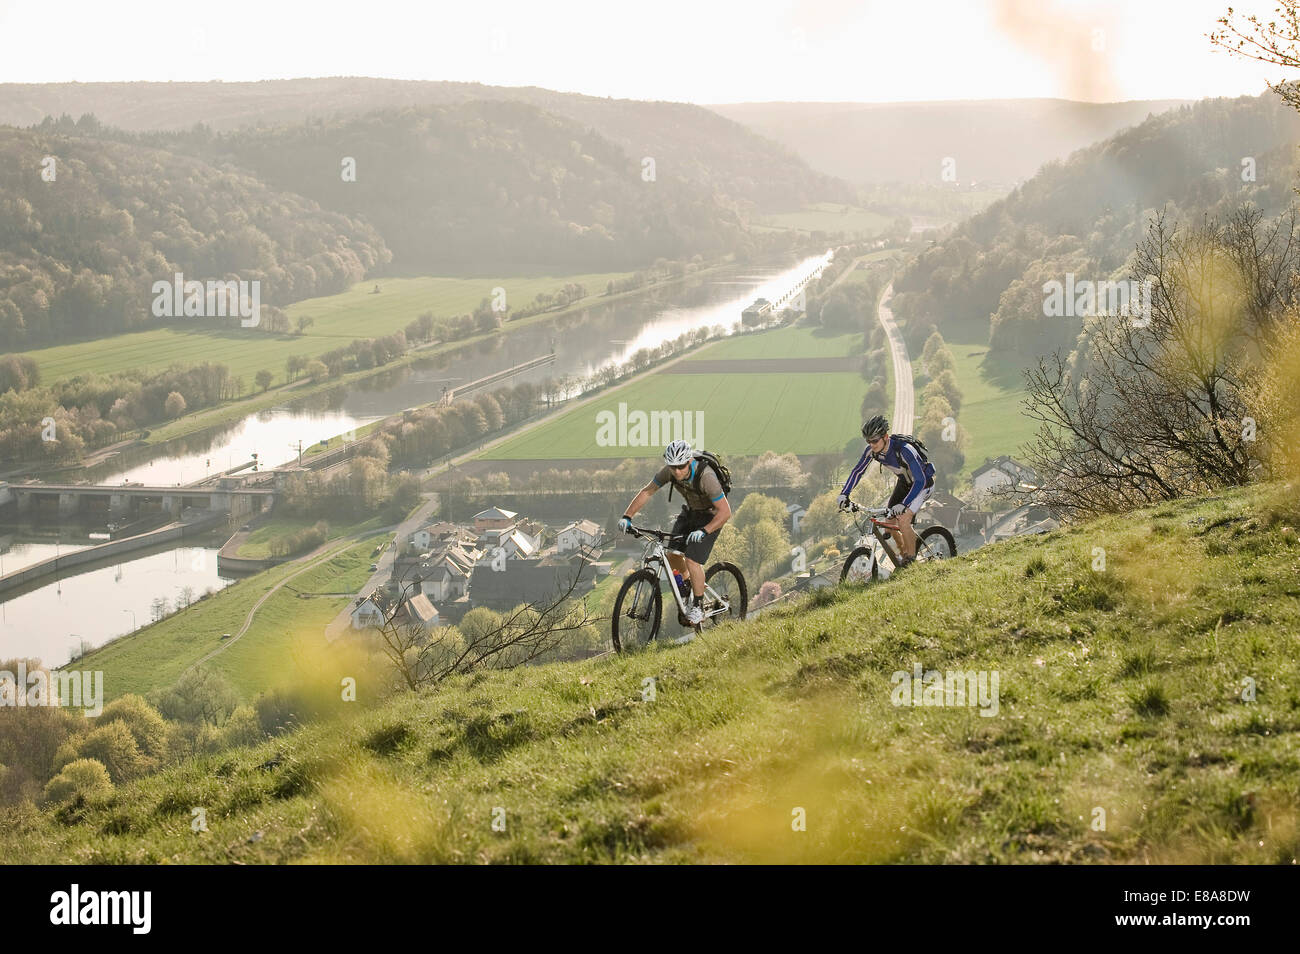 Giovani uomini mountainbike al tramonto, Baviera, Germania Immagini Stock